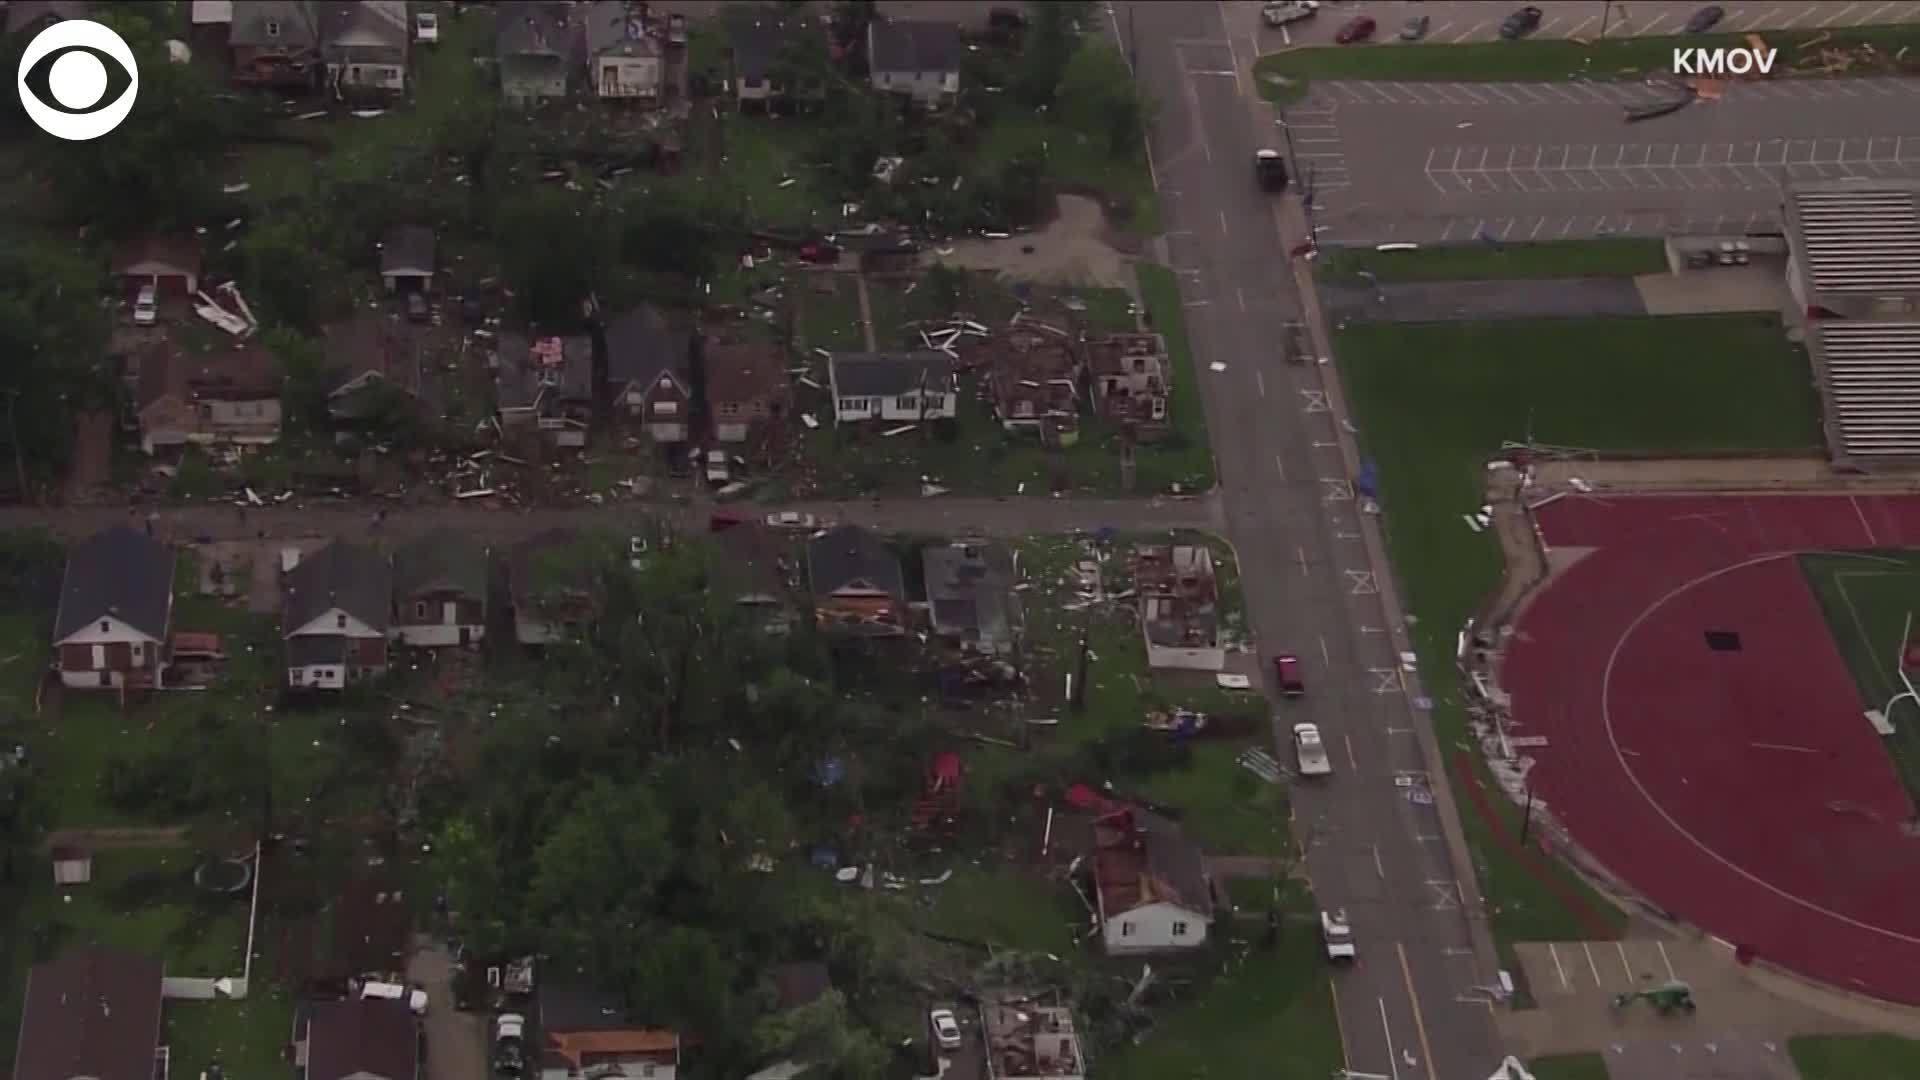 CBS Jefferson City MO Damage